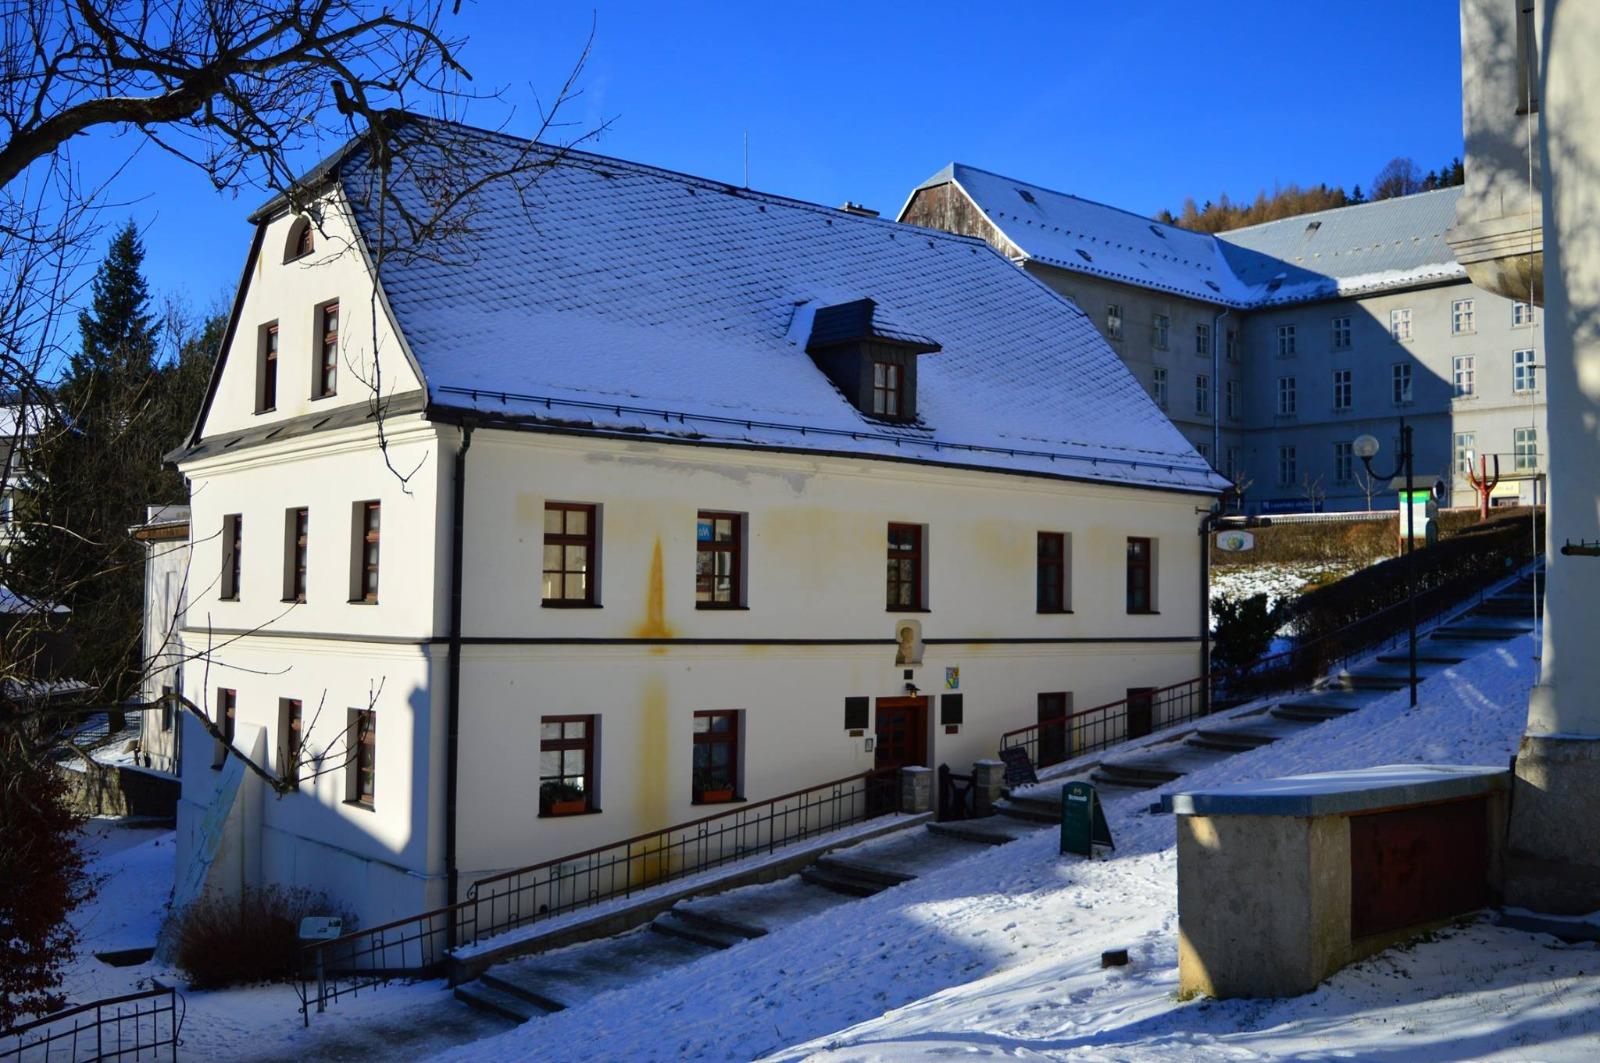 Muzeum Vincenze Priessnitze